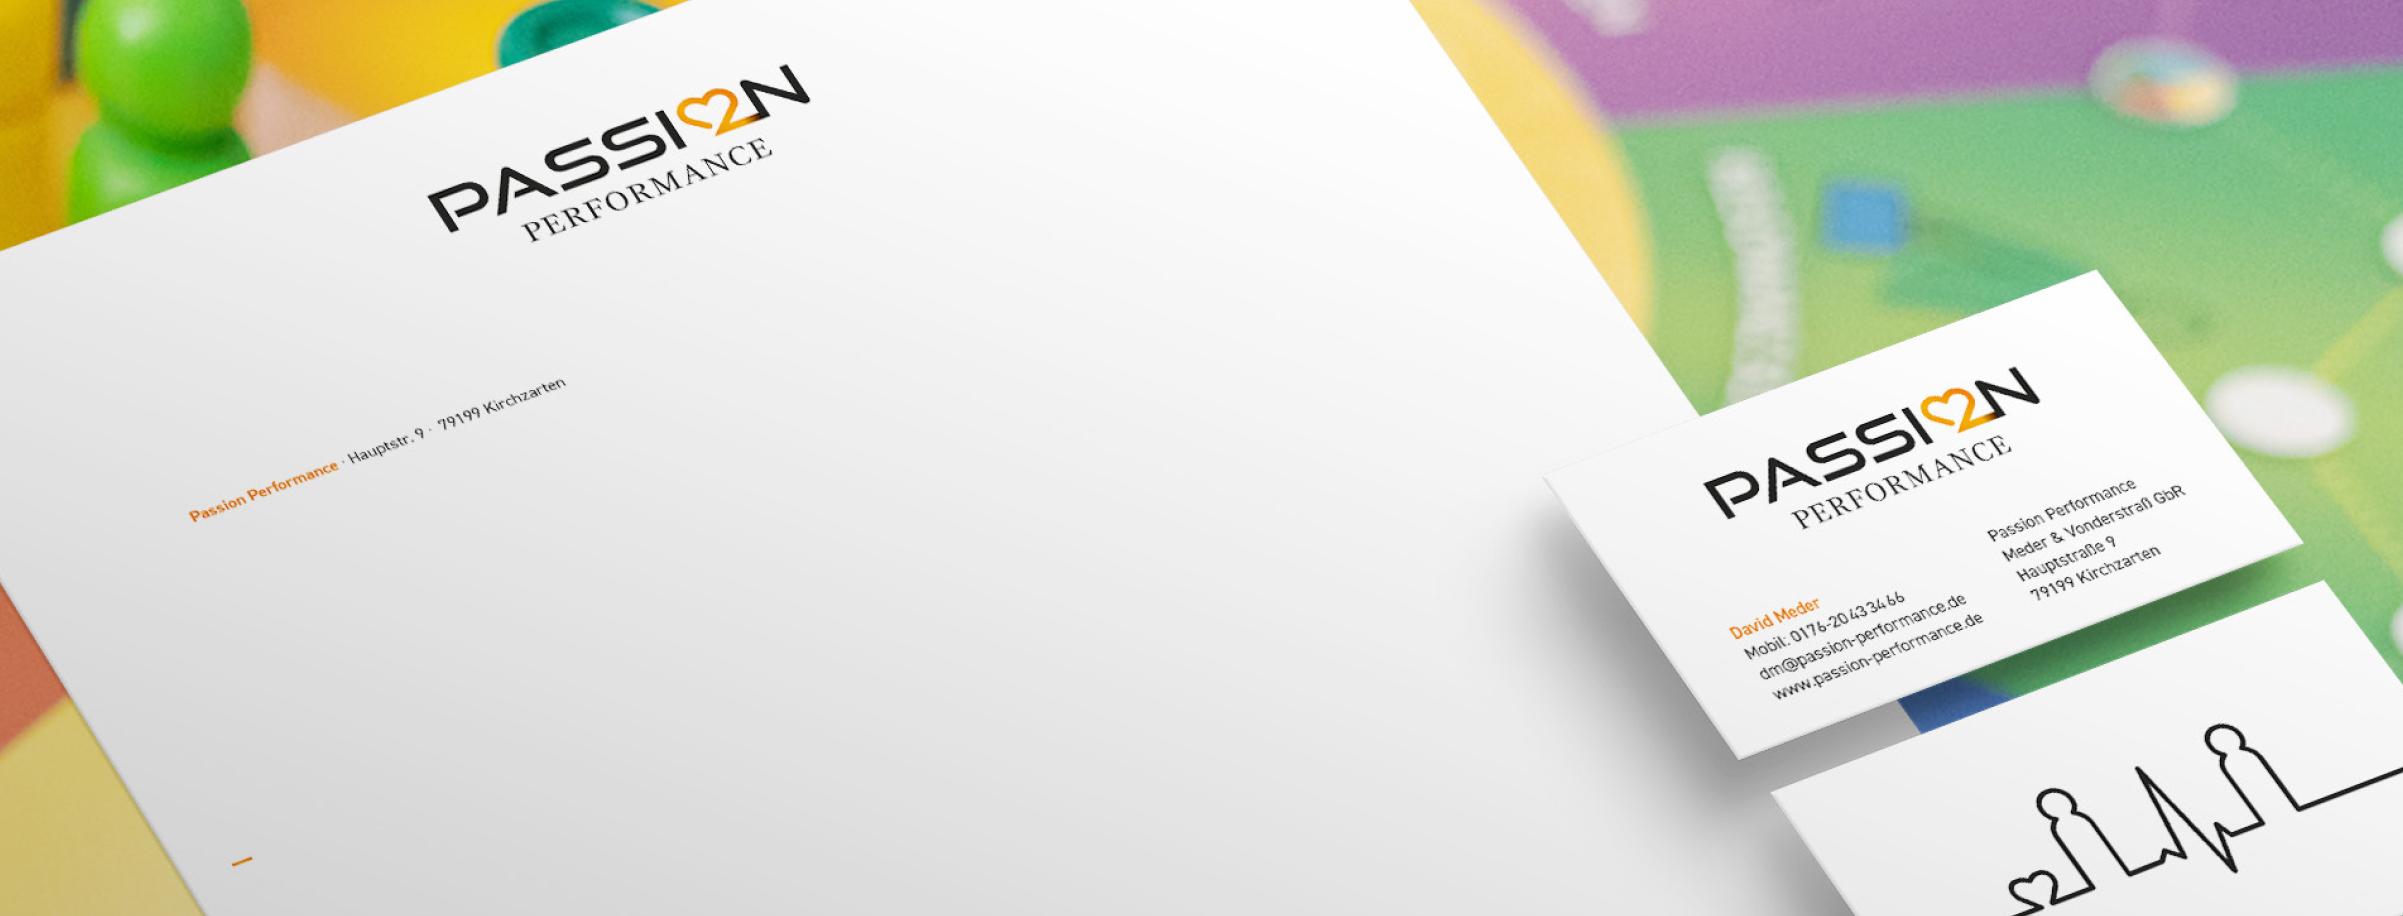 referenz-agentur-heidelberg-logodesign-gestalten-logo